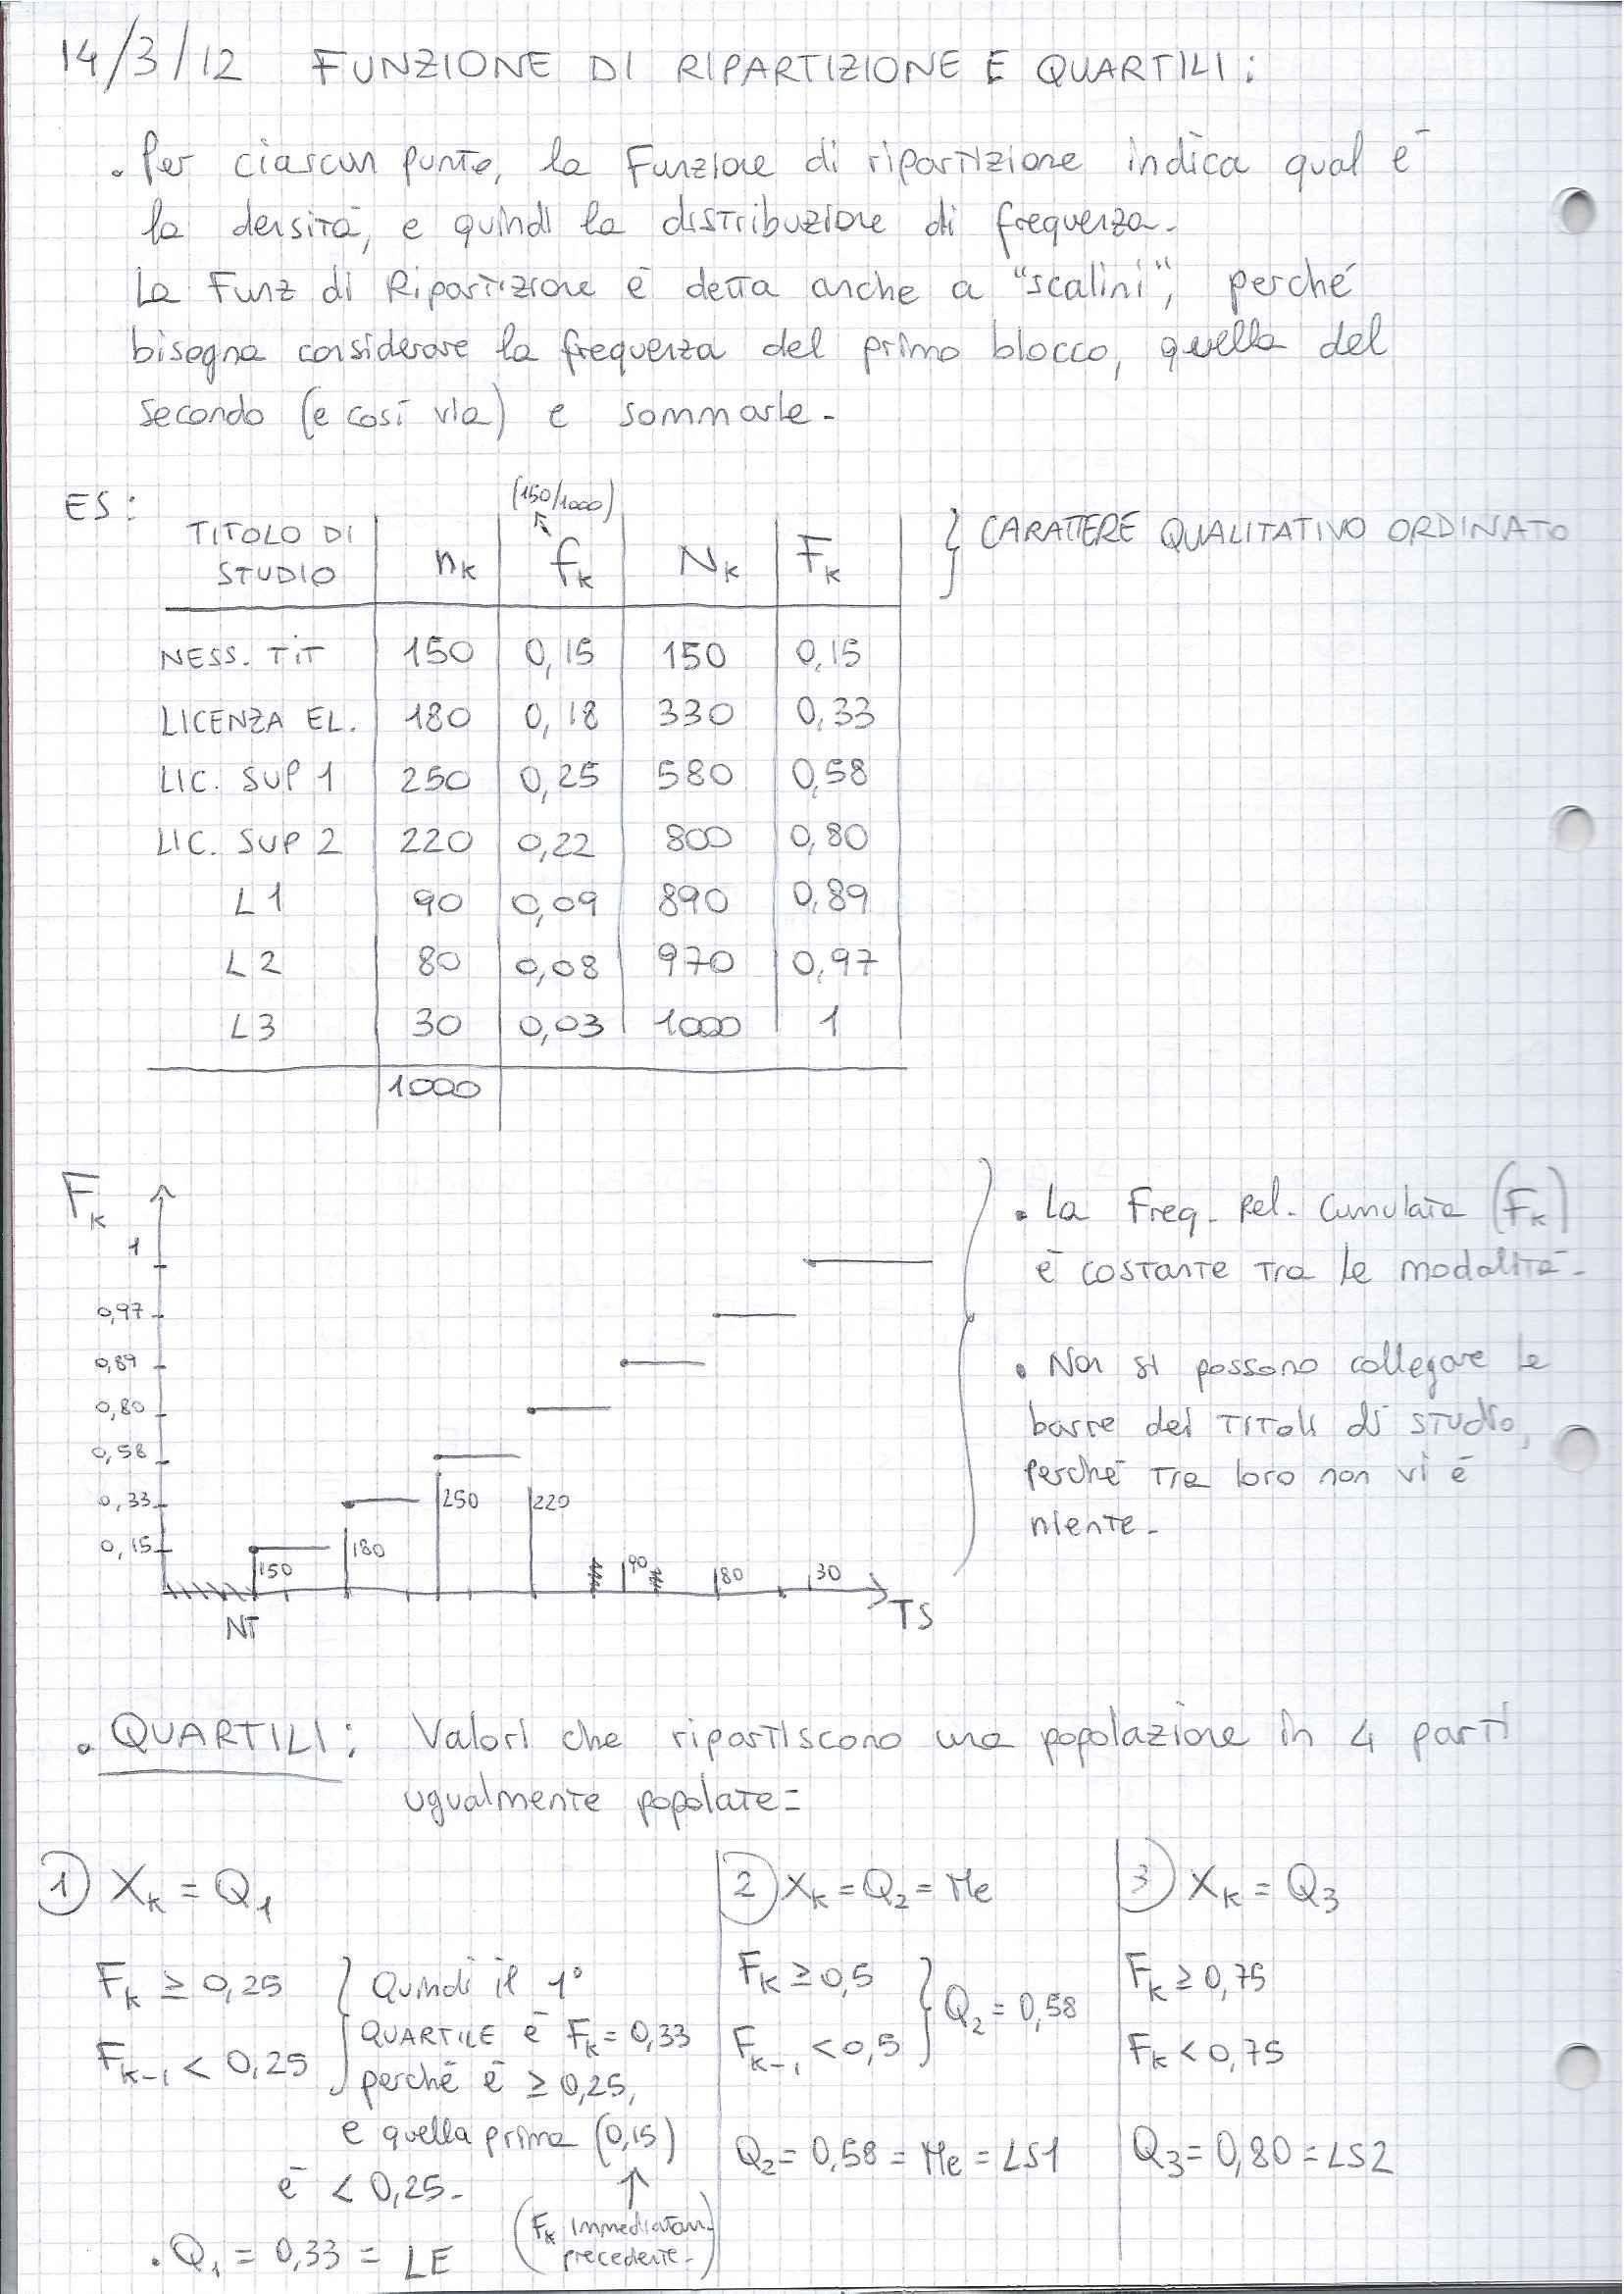 appunto F. Lagona Statistica